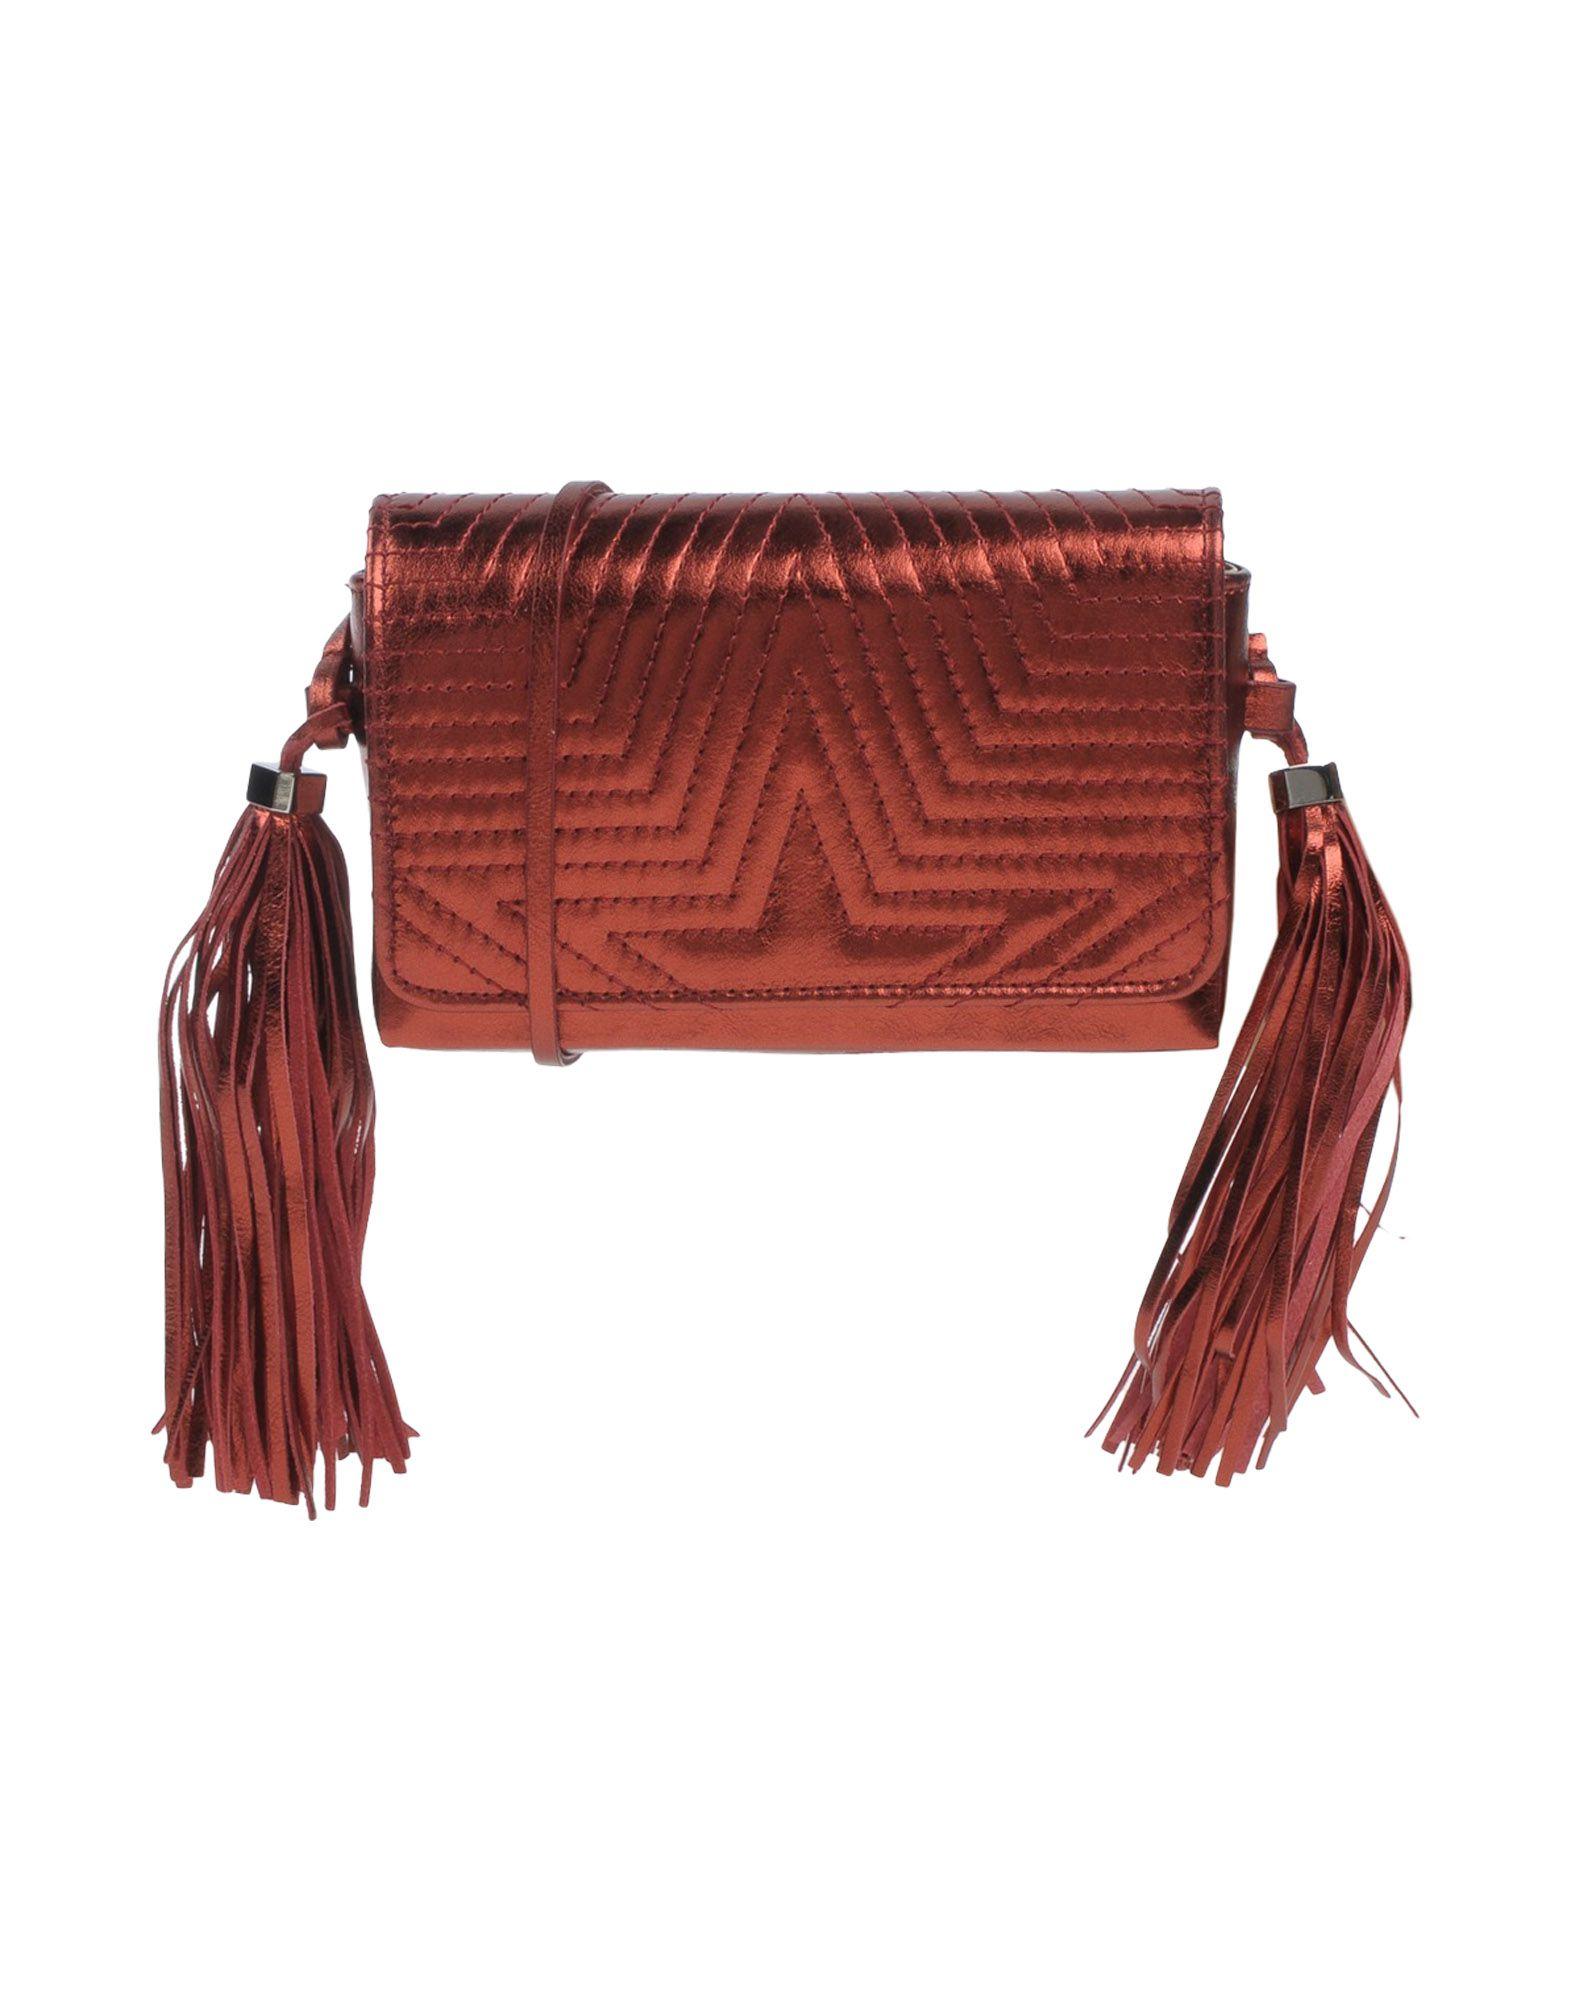 GOLDEN GOOSE DELUXE BRAND Сумка через плечо сумка через плечо brand new 2 7 hombre maletin b10023